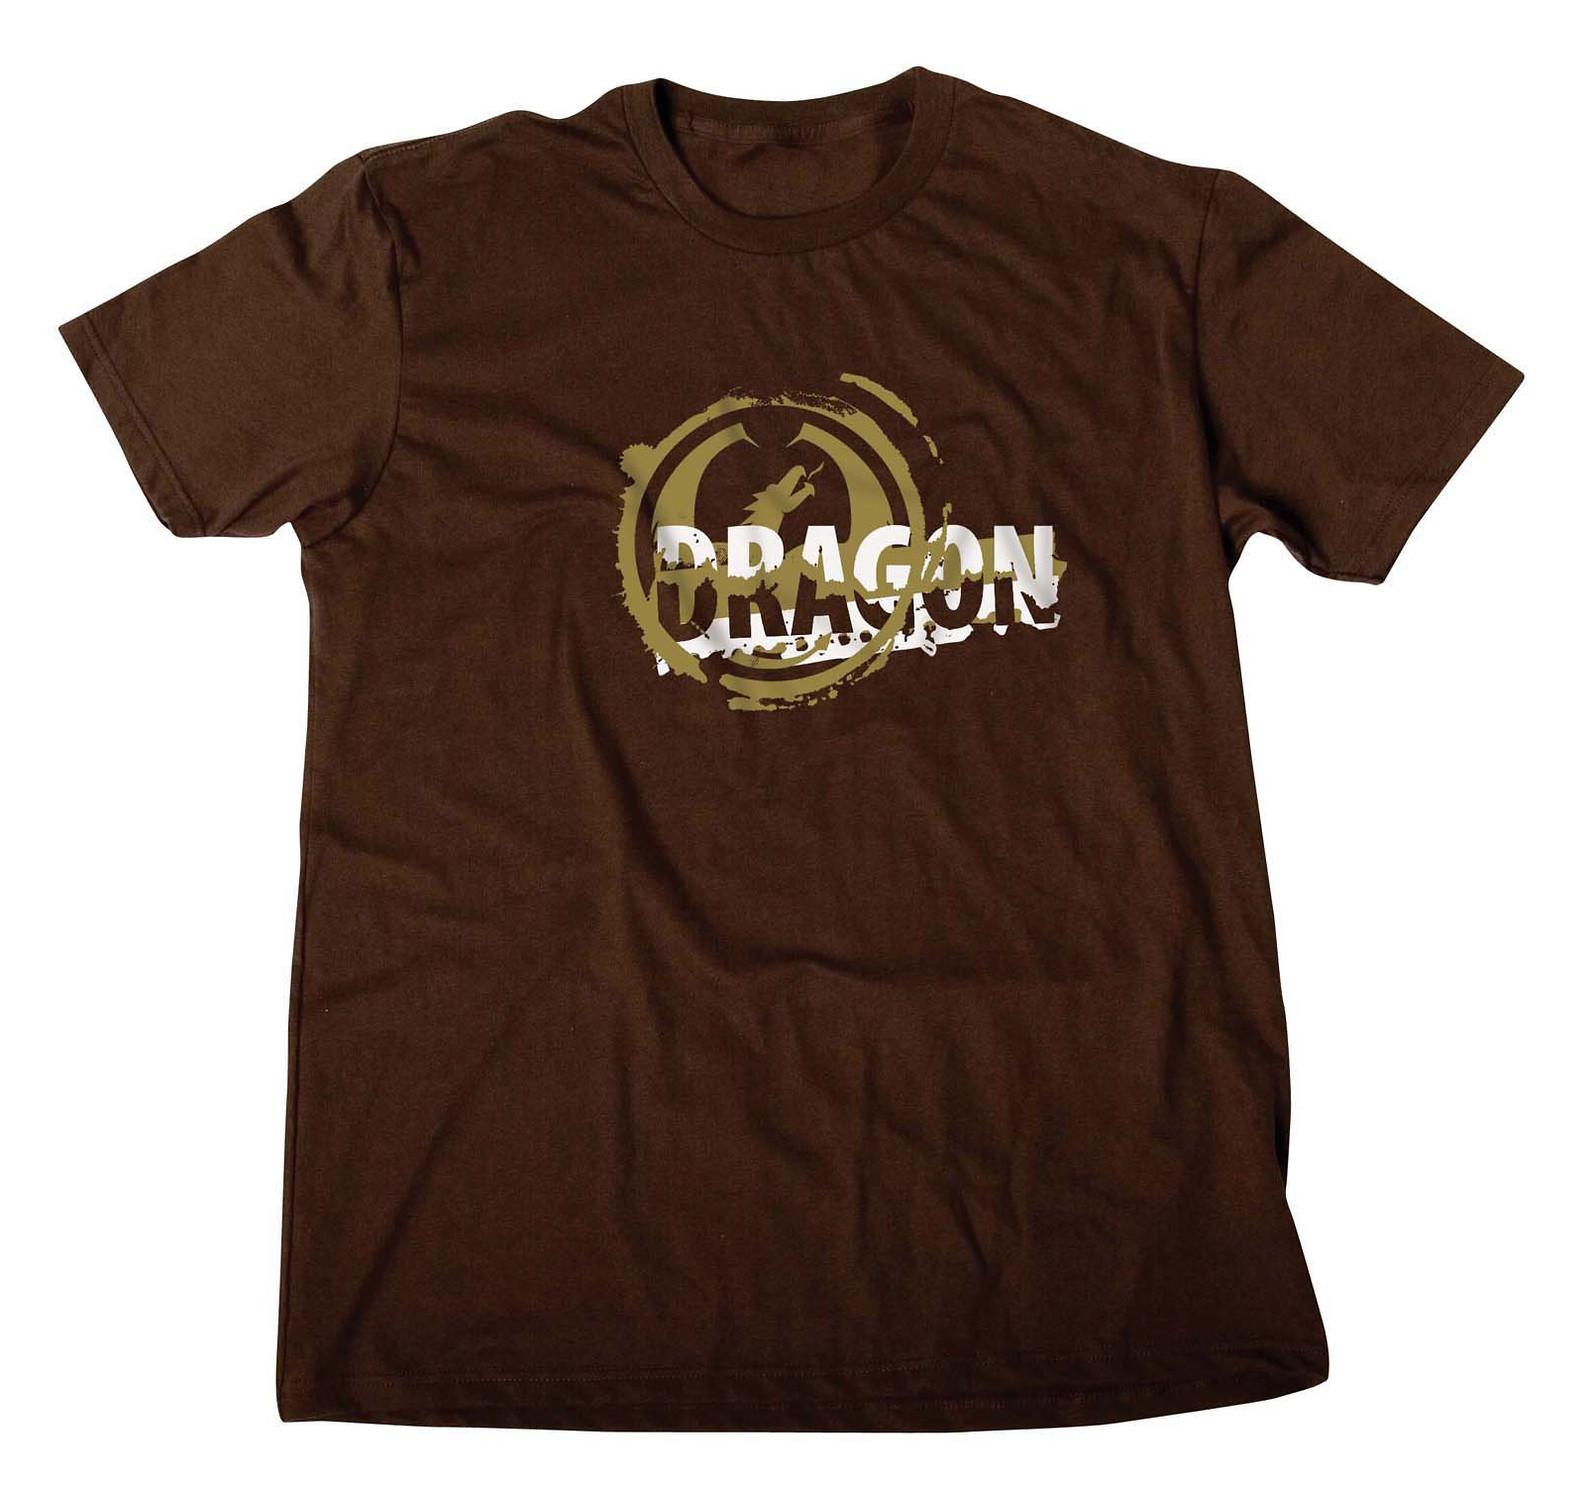 dragon-troller-t-yth-drkchocolate-08.jpg